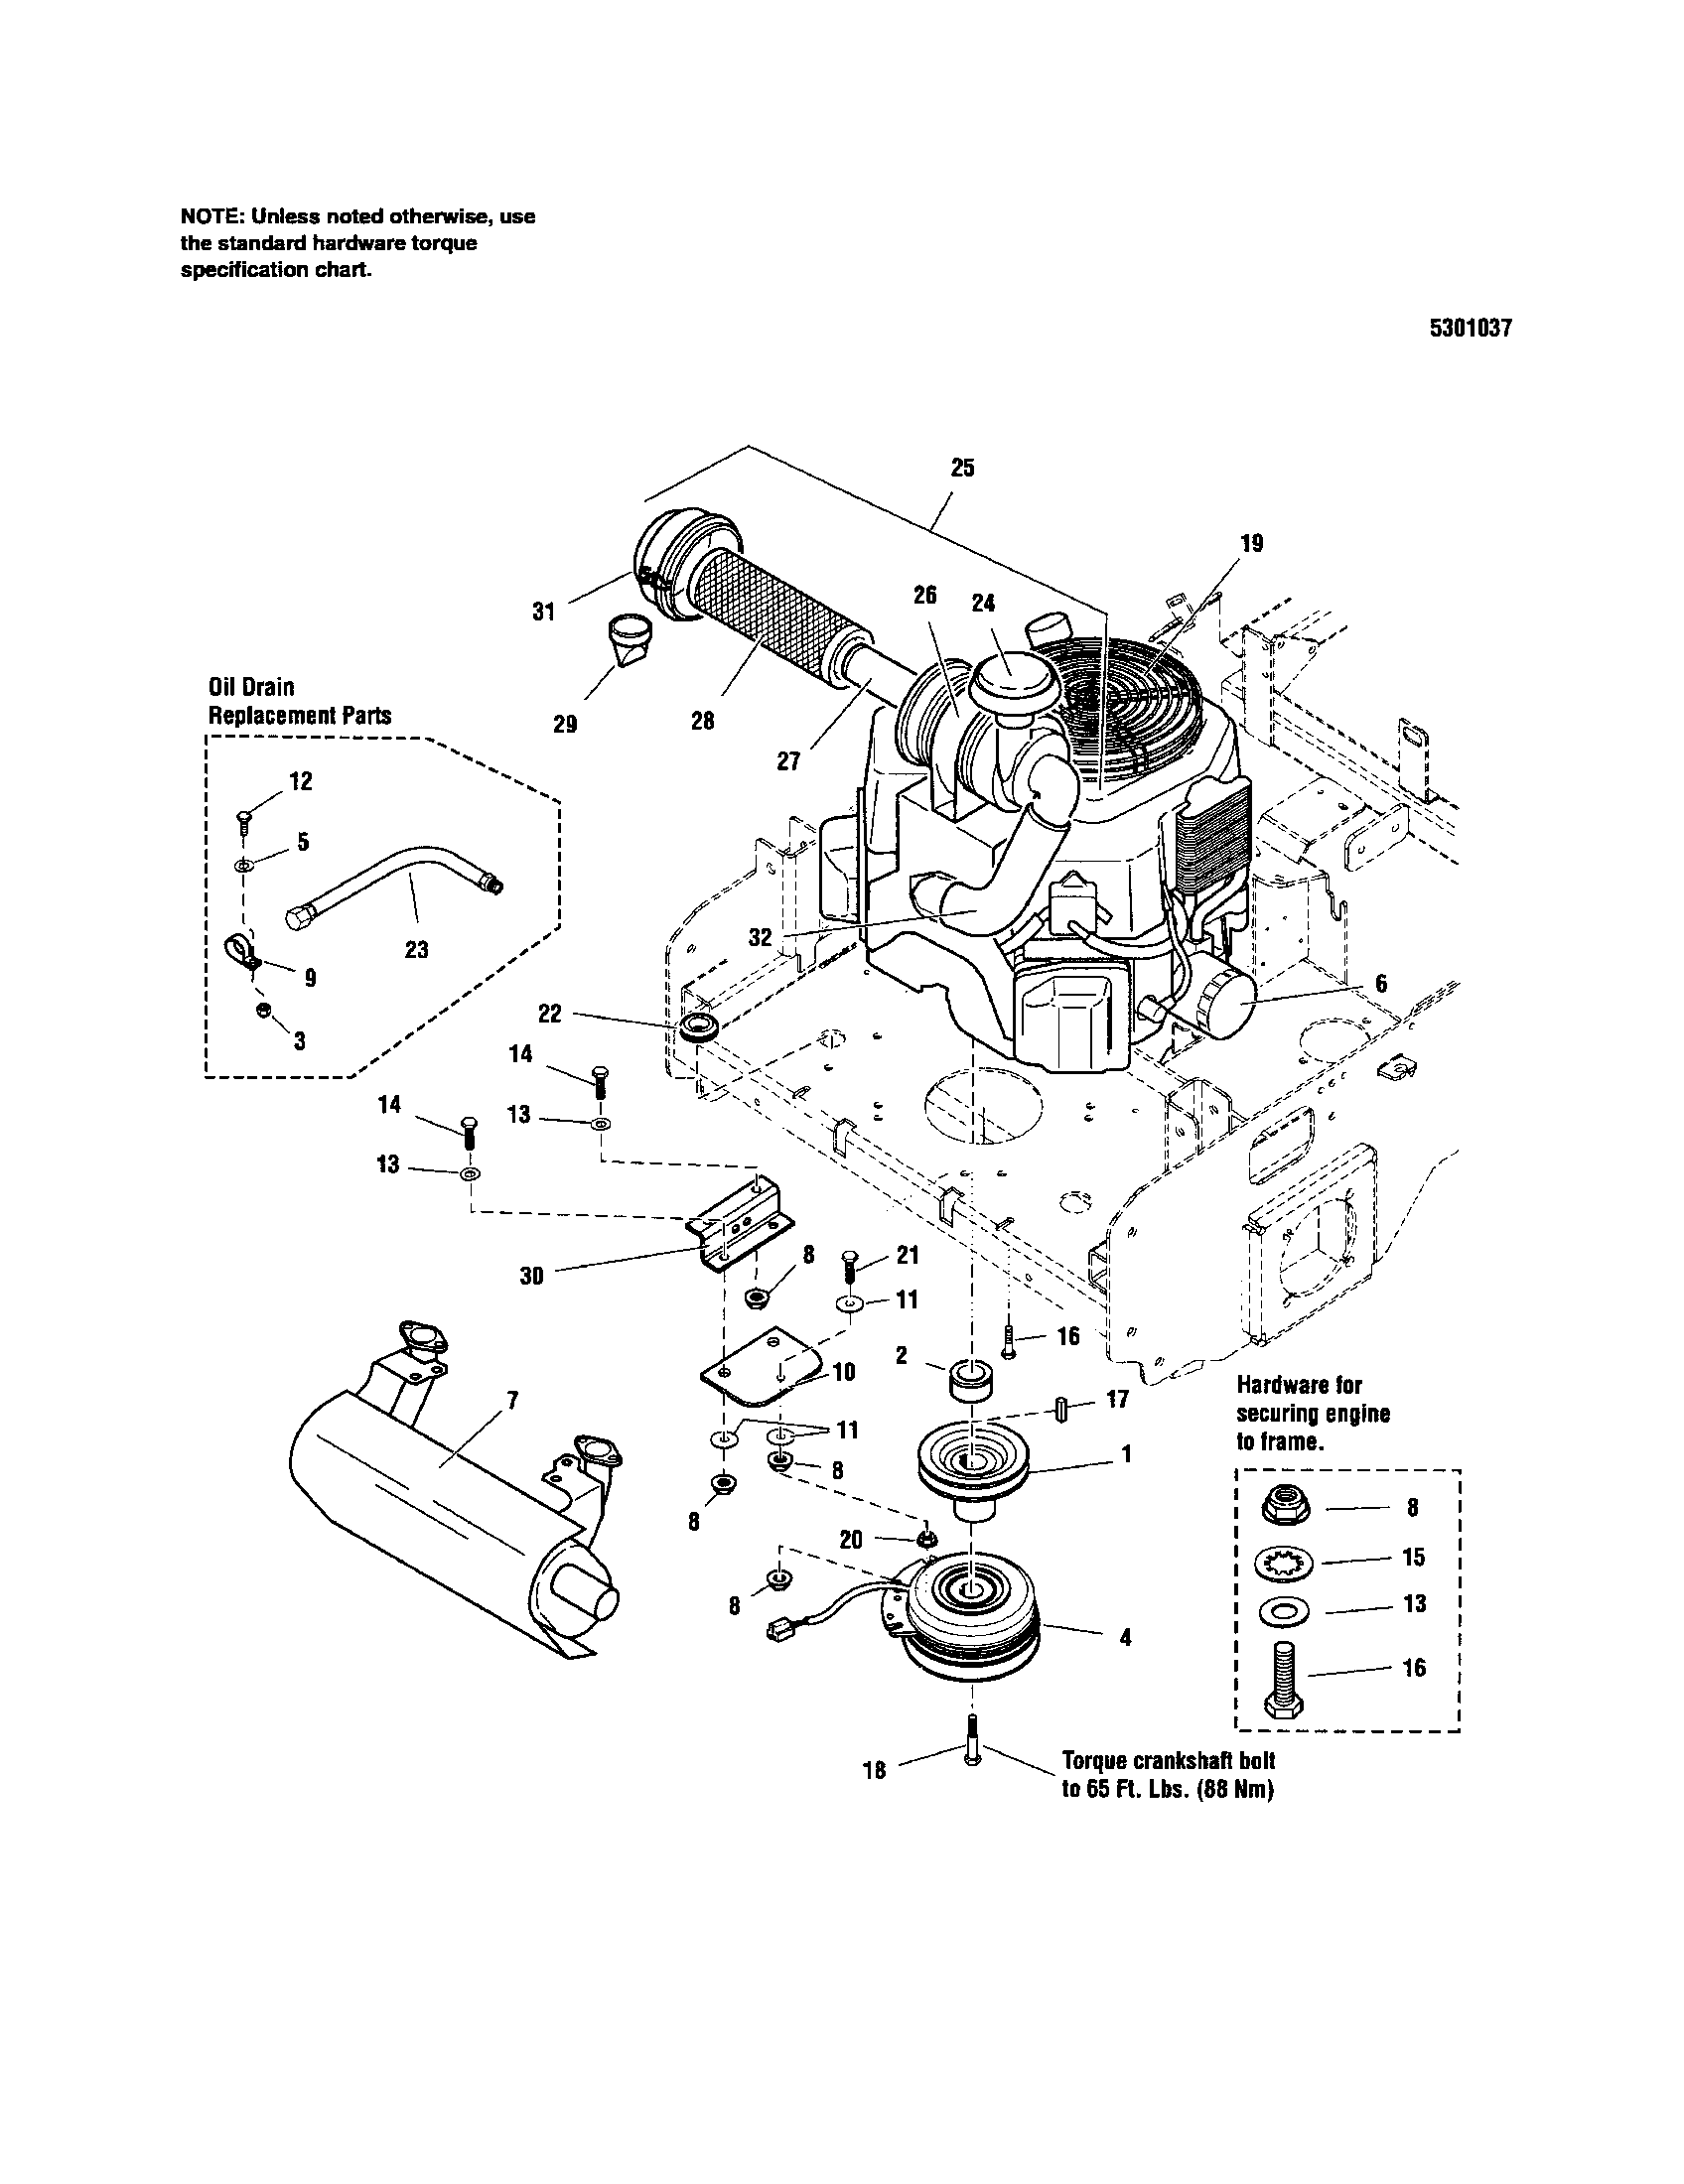 snapper 5900693 engine pto 27 hp kohler diagram [ 1696 x 2200 Pixel ]